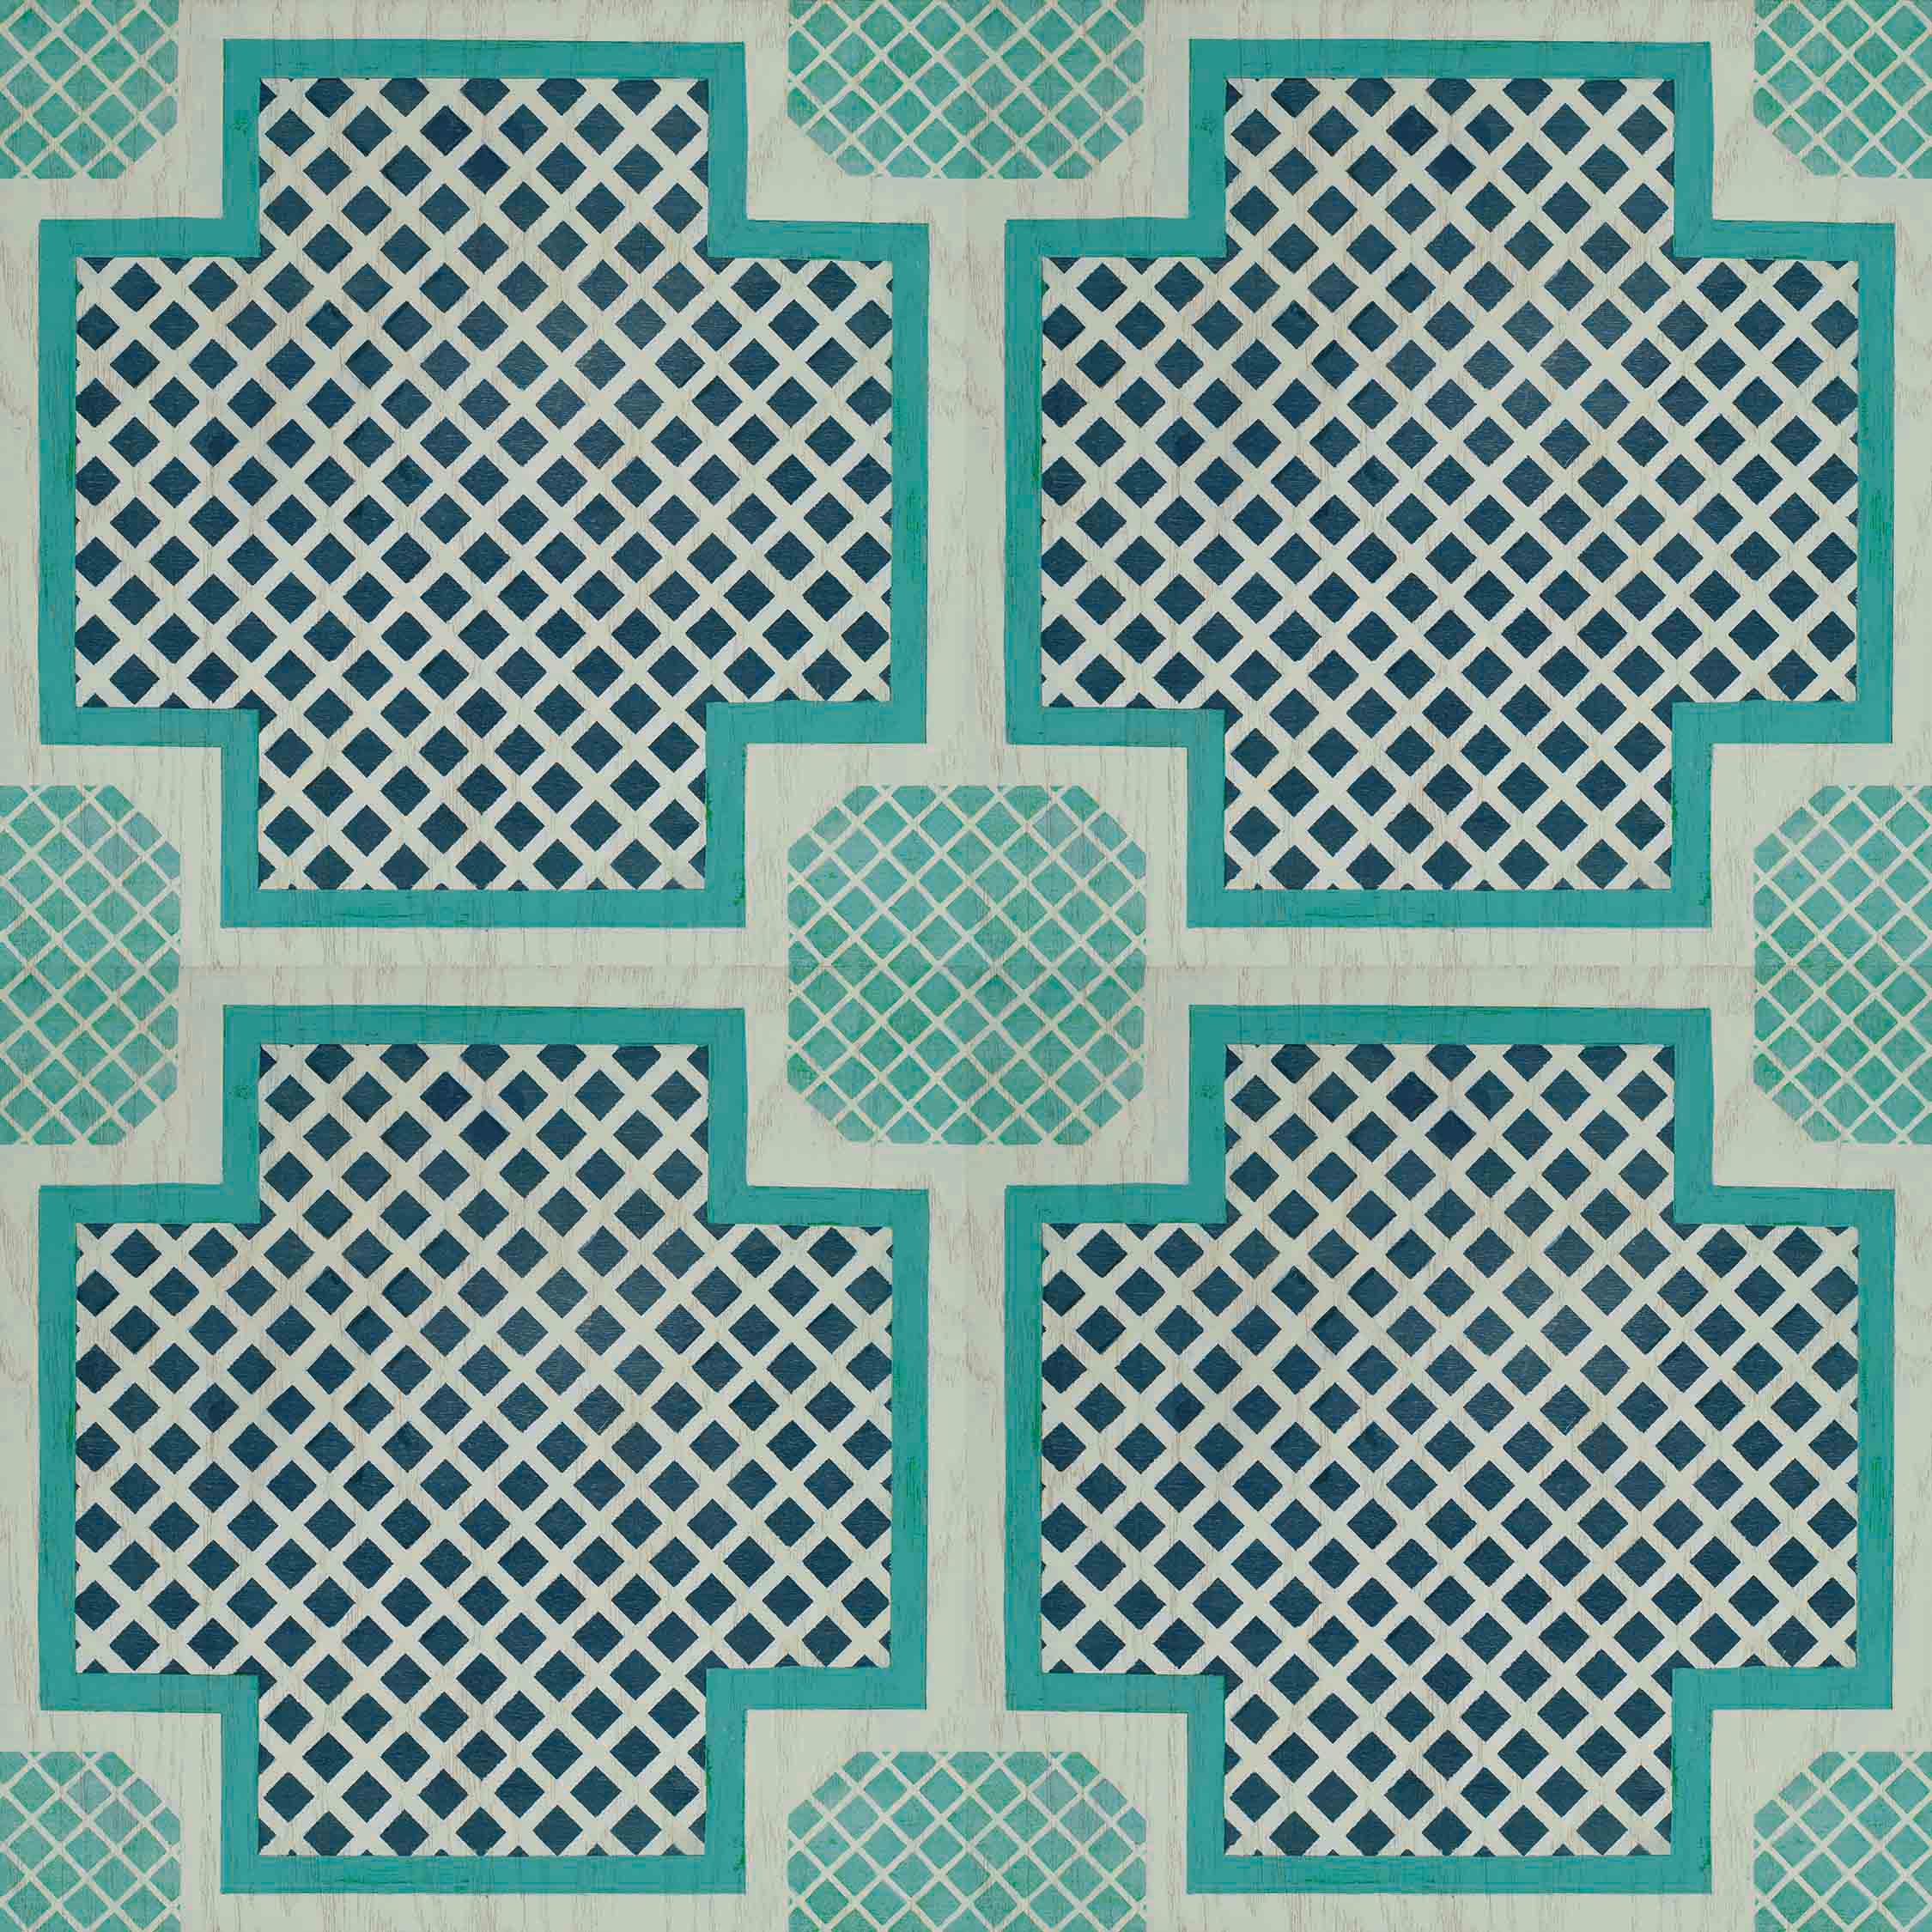 SAMPLE Poppy CoralMint Removable Peel and Stick Temporary Decorative Vinyl Floor Decal Sticker Tile